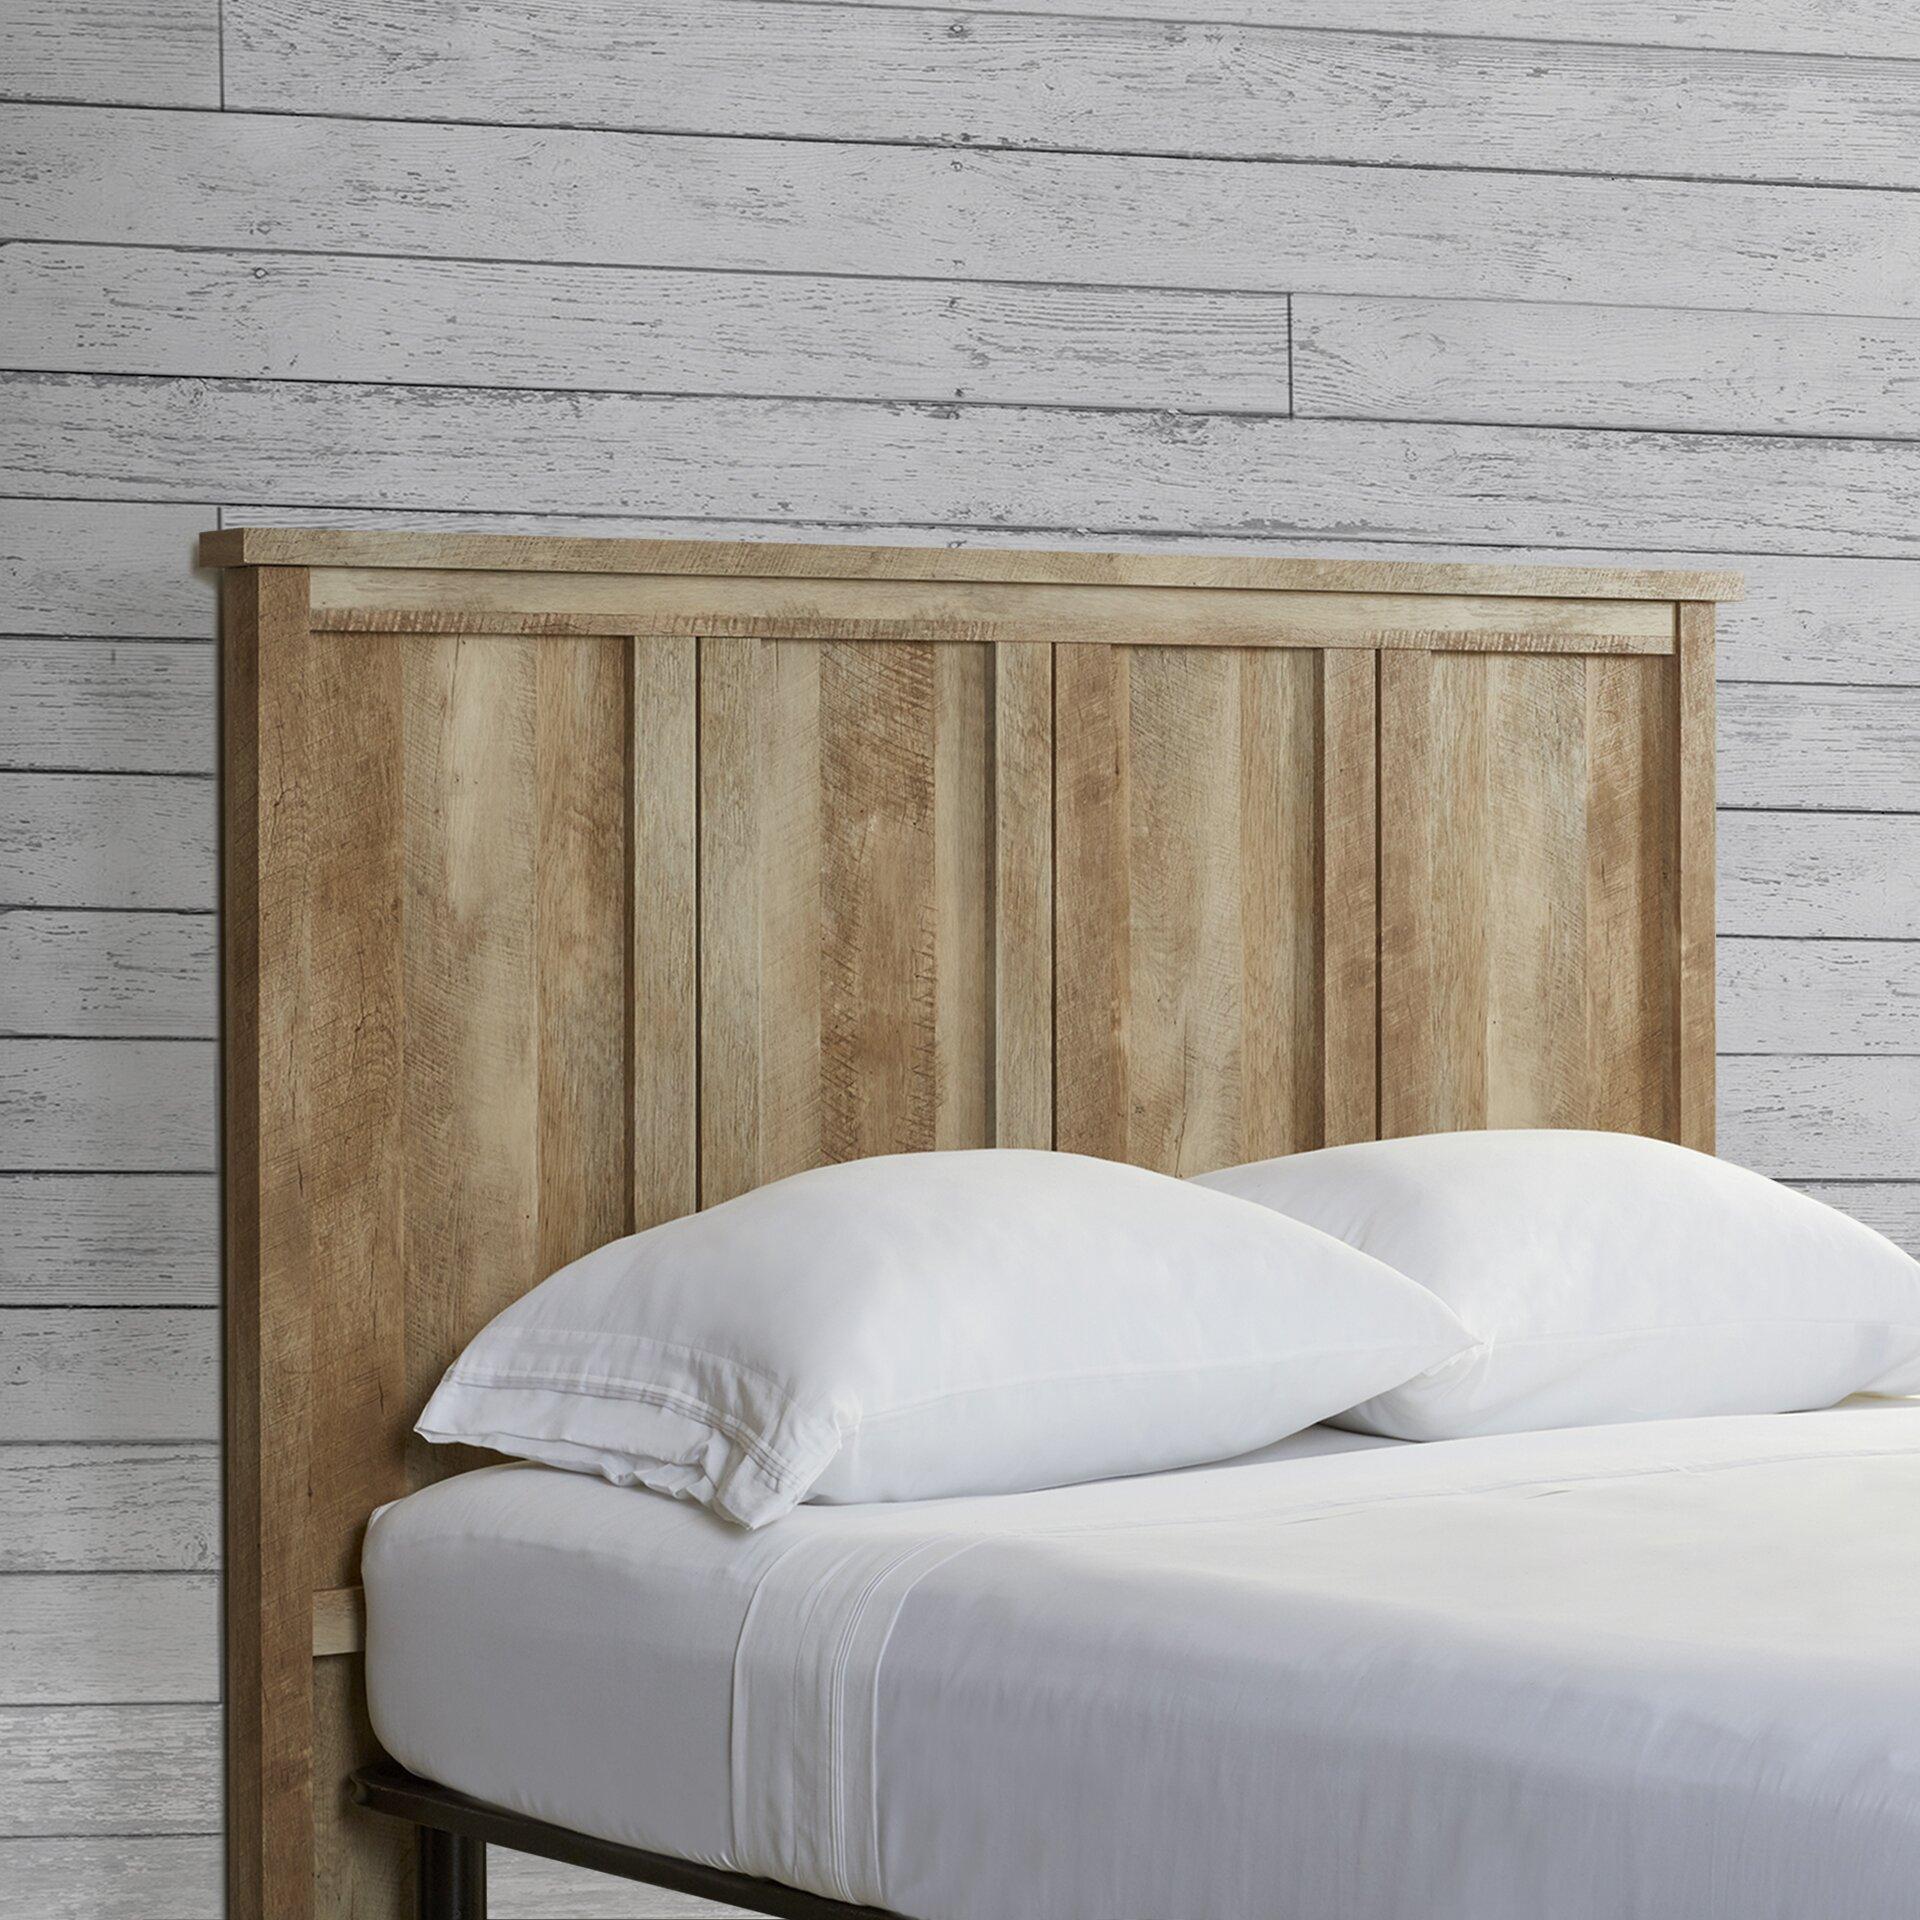 Full Wood Headboard : Loon Peak Sunlight Spire Full Wood Headboard & Reviews  Wayfair